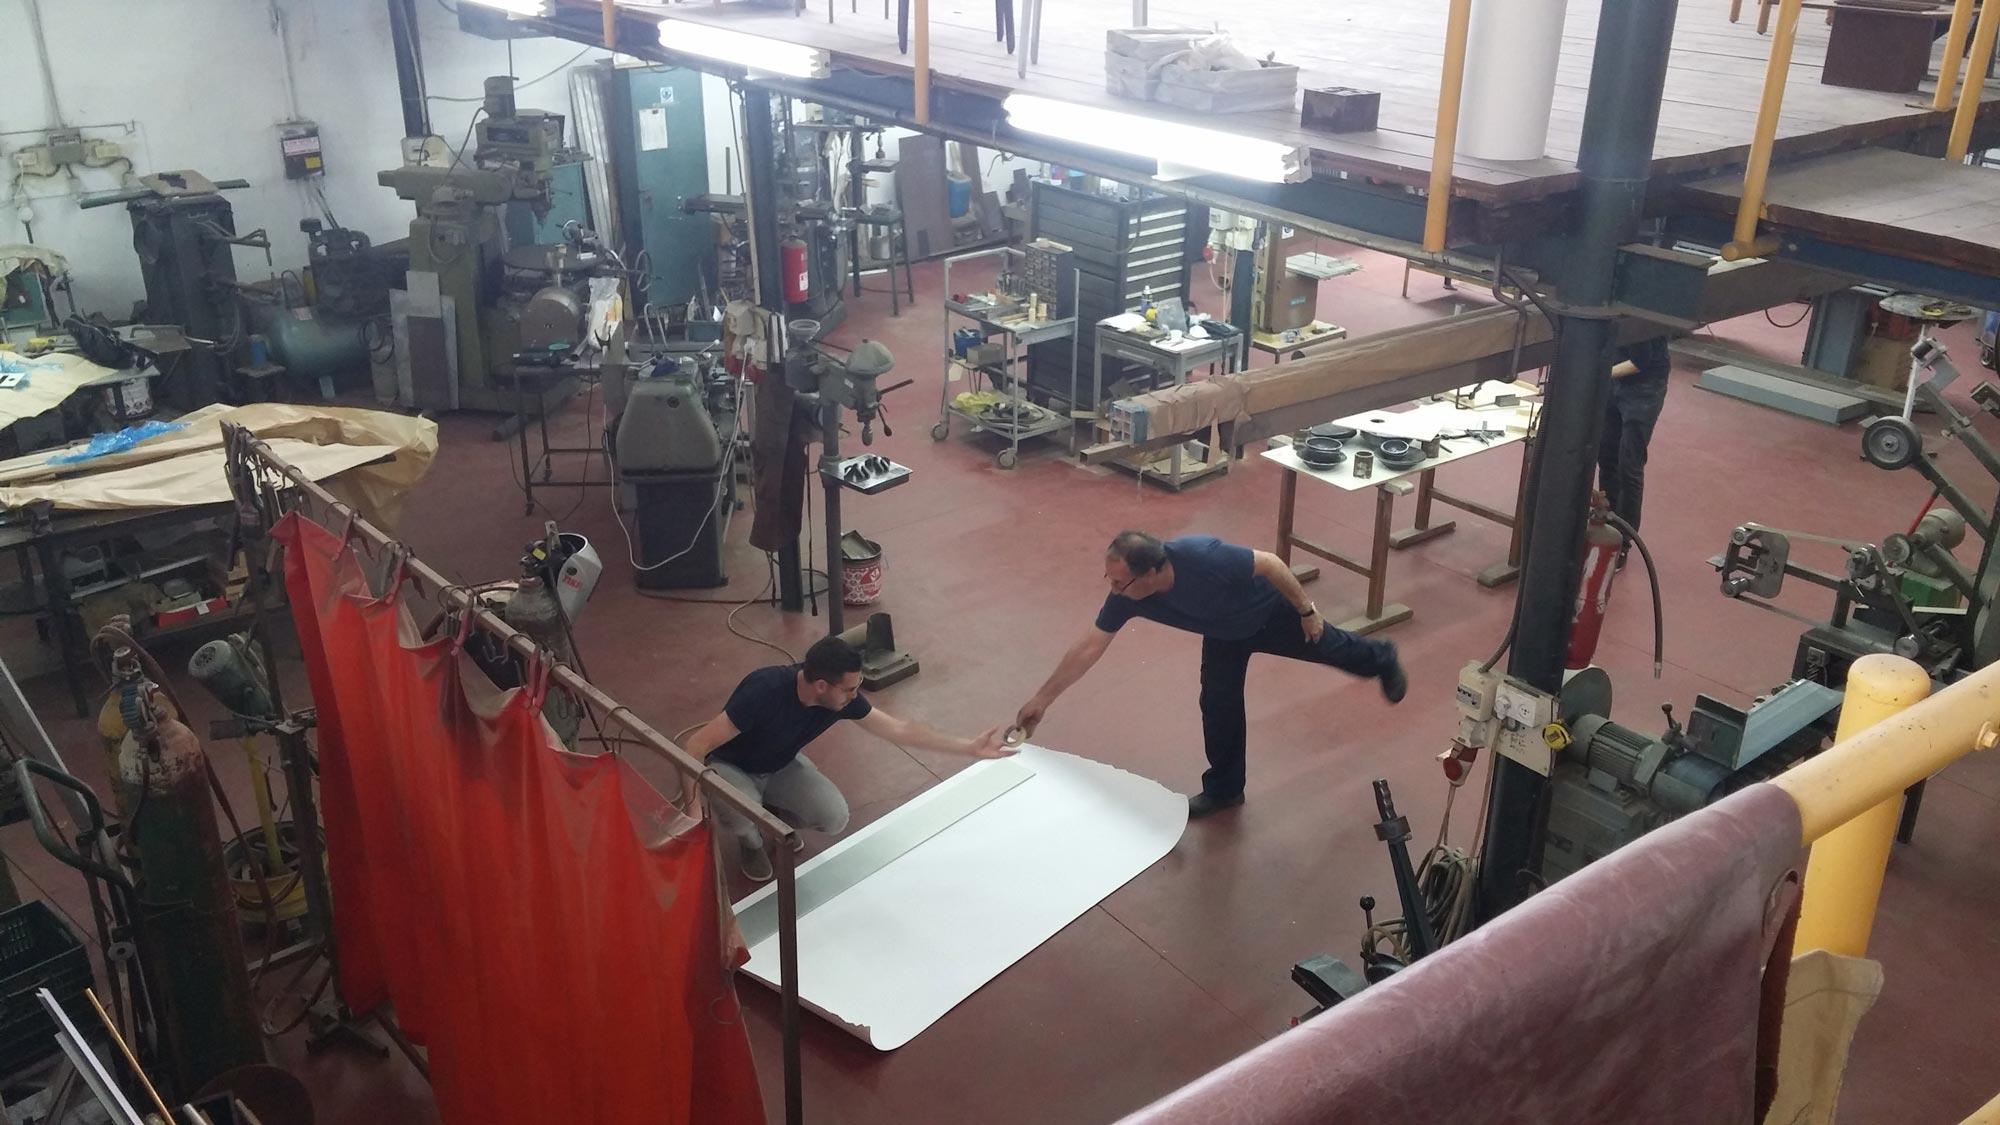 Work In progress in the metal shop